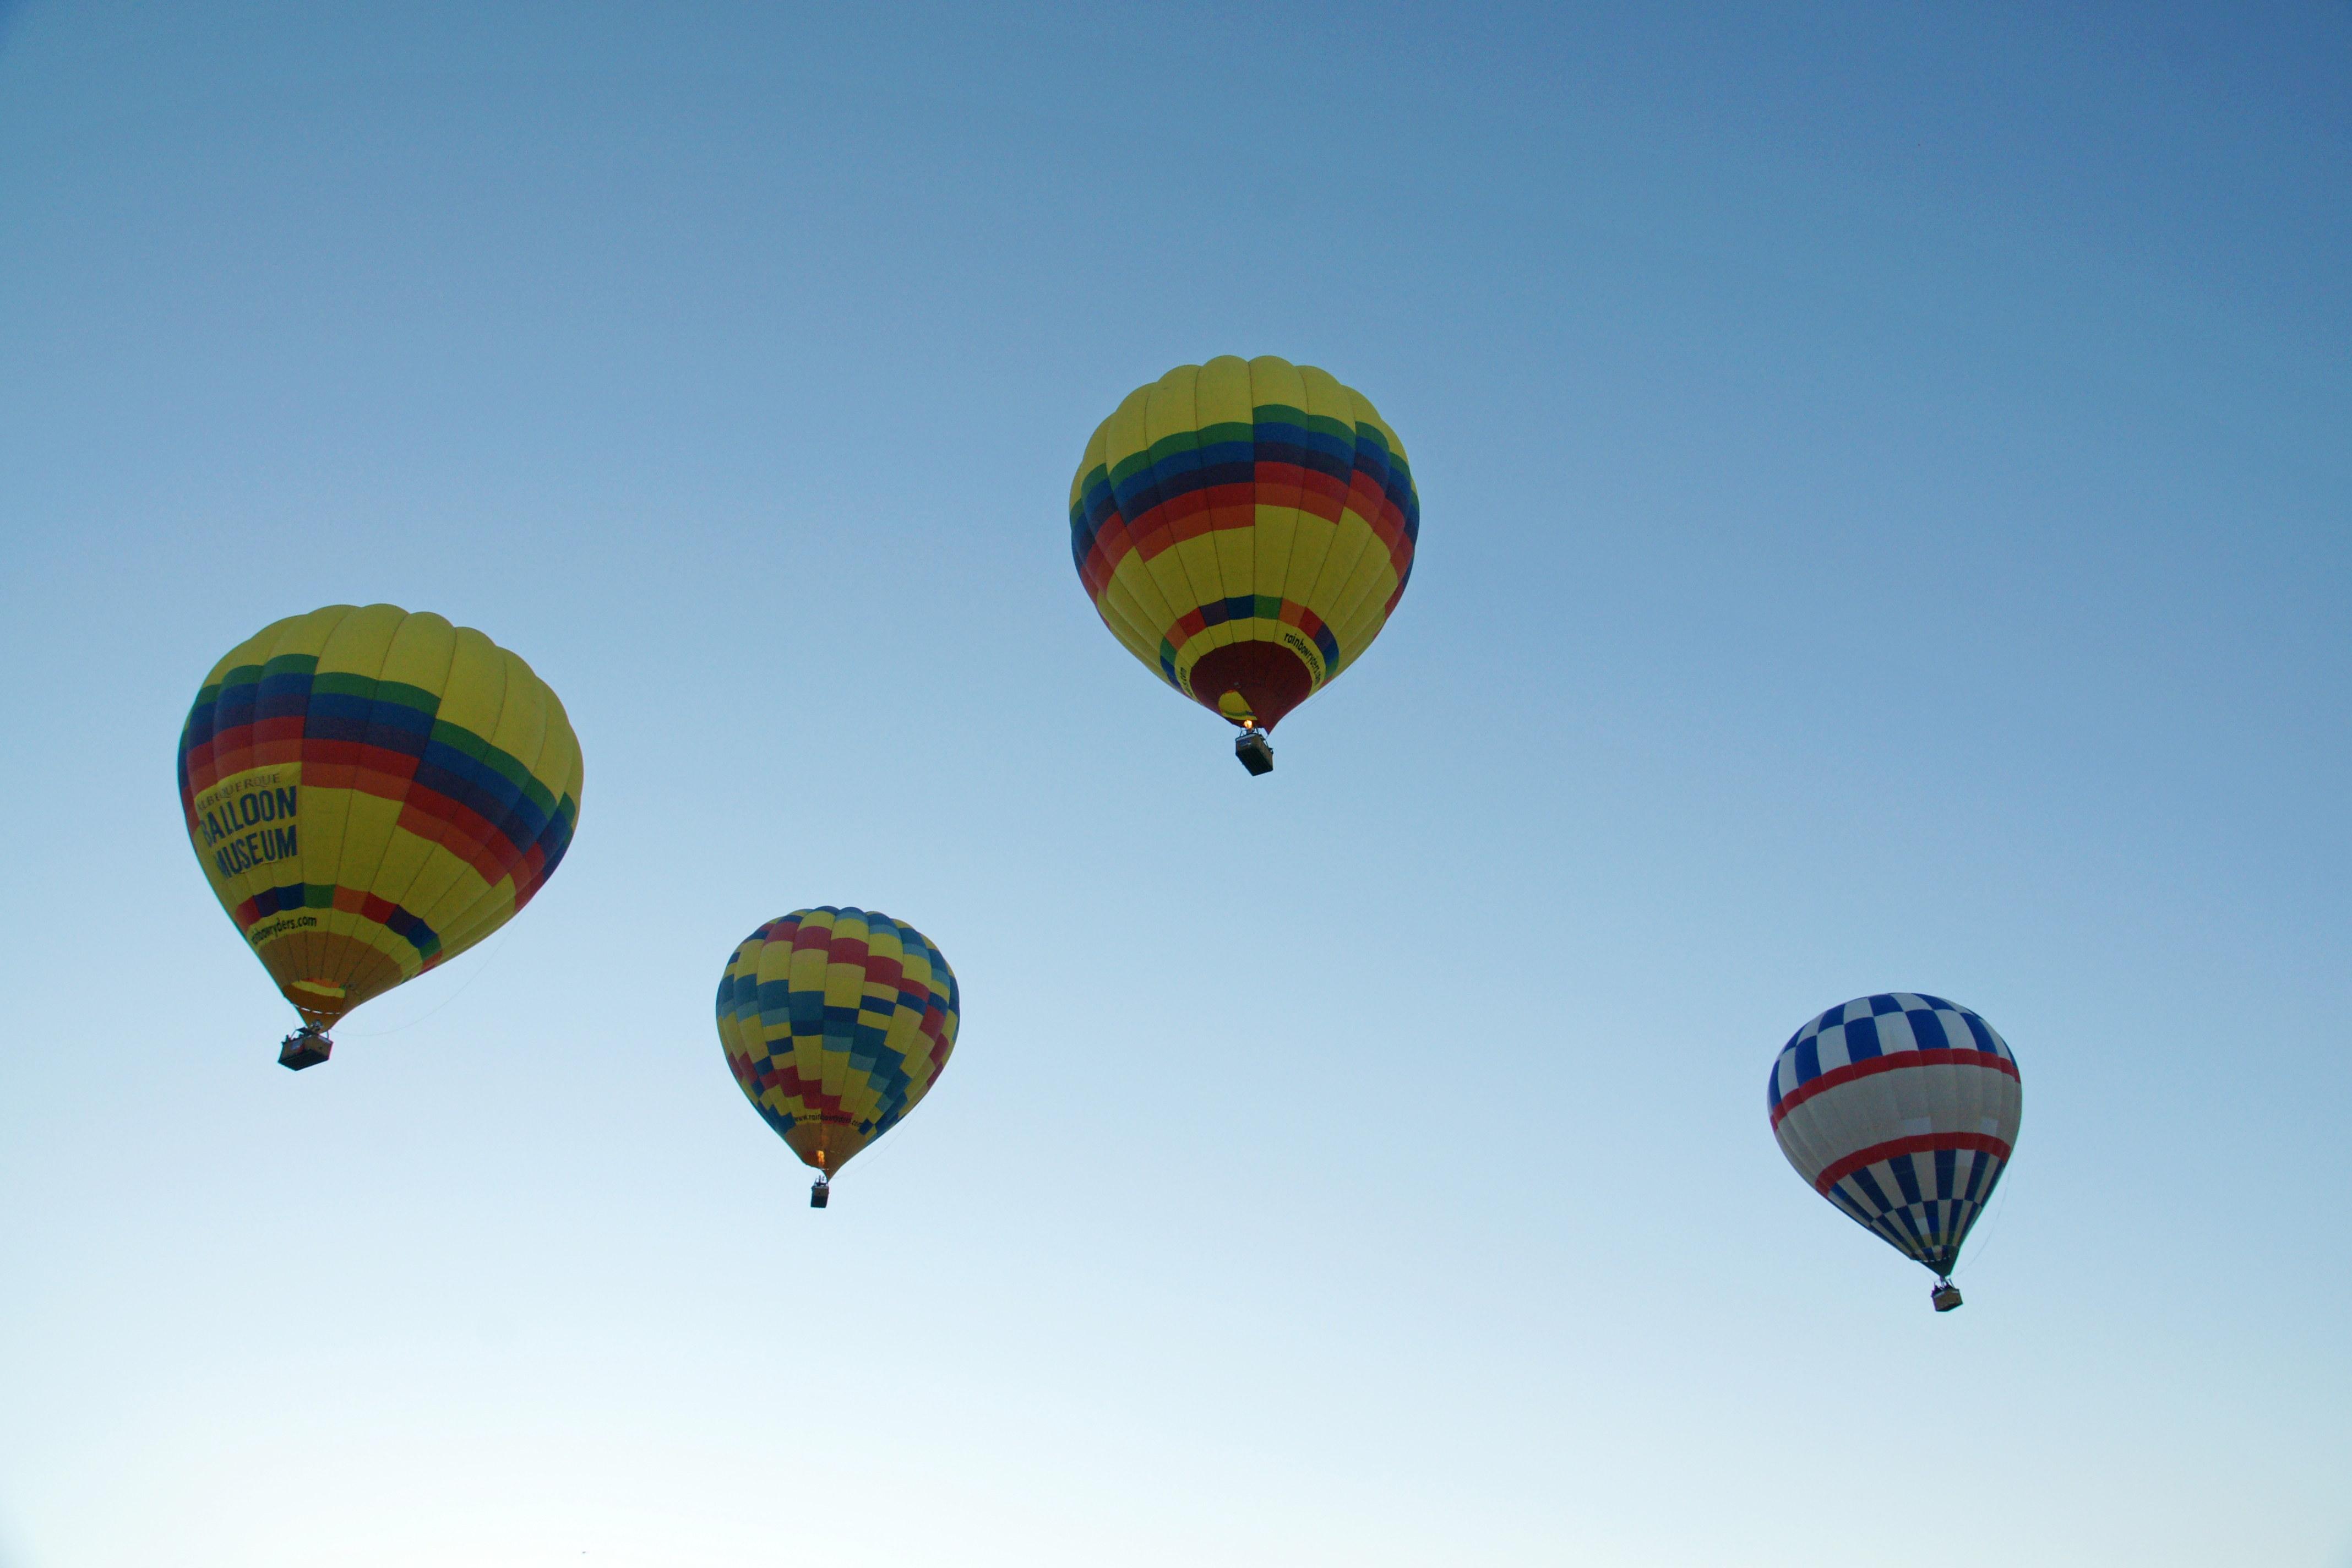 aibf-Single-Balloons-Gallery03